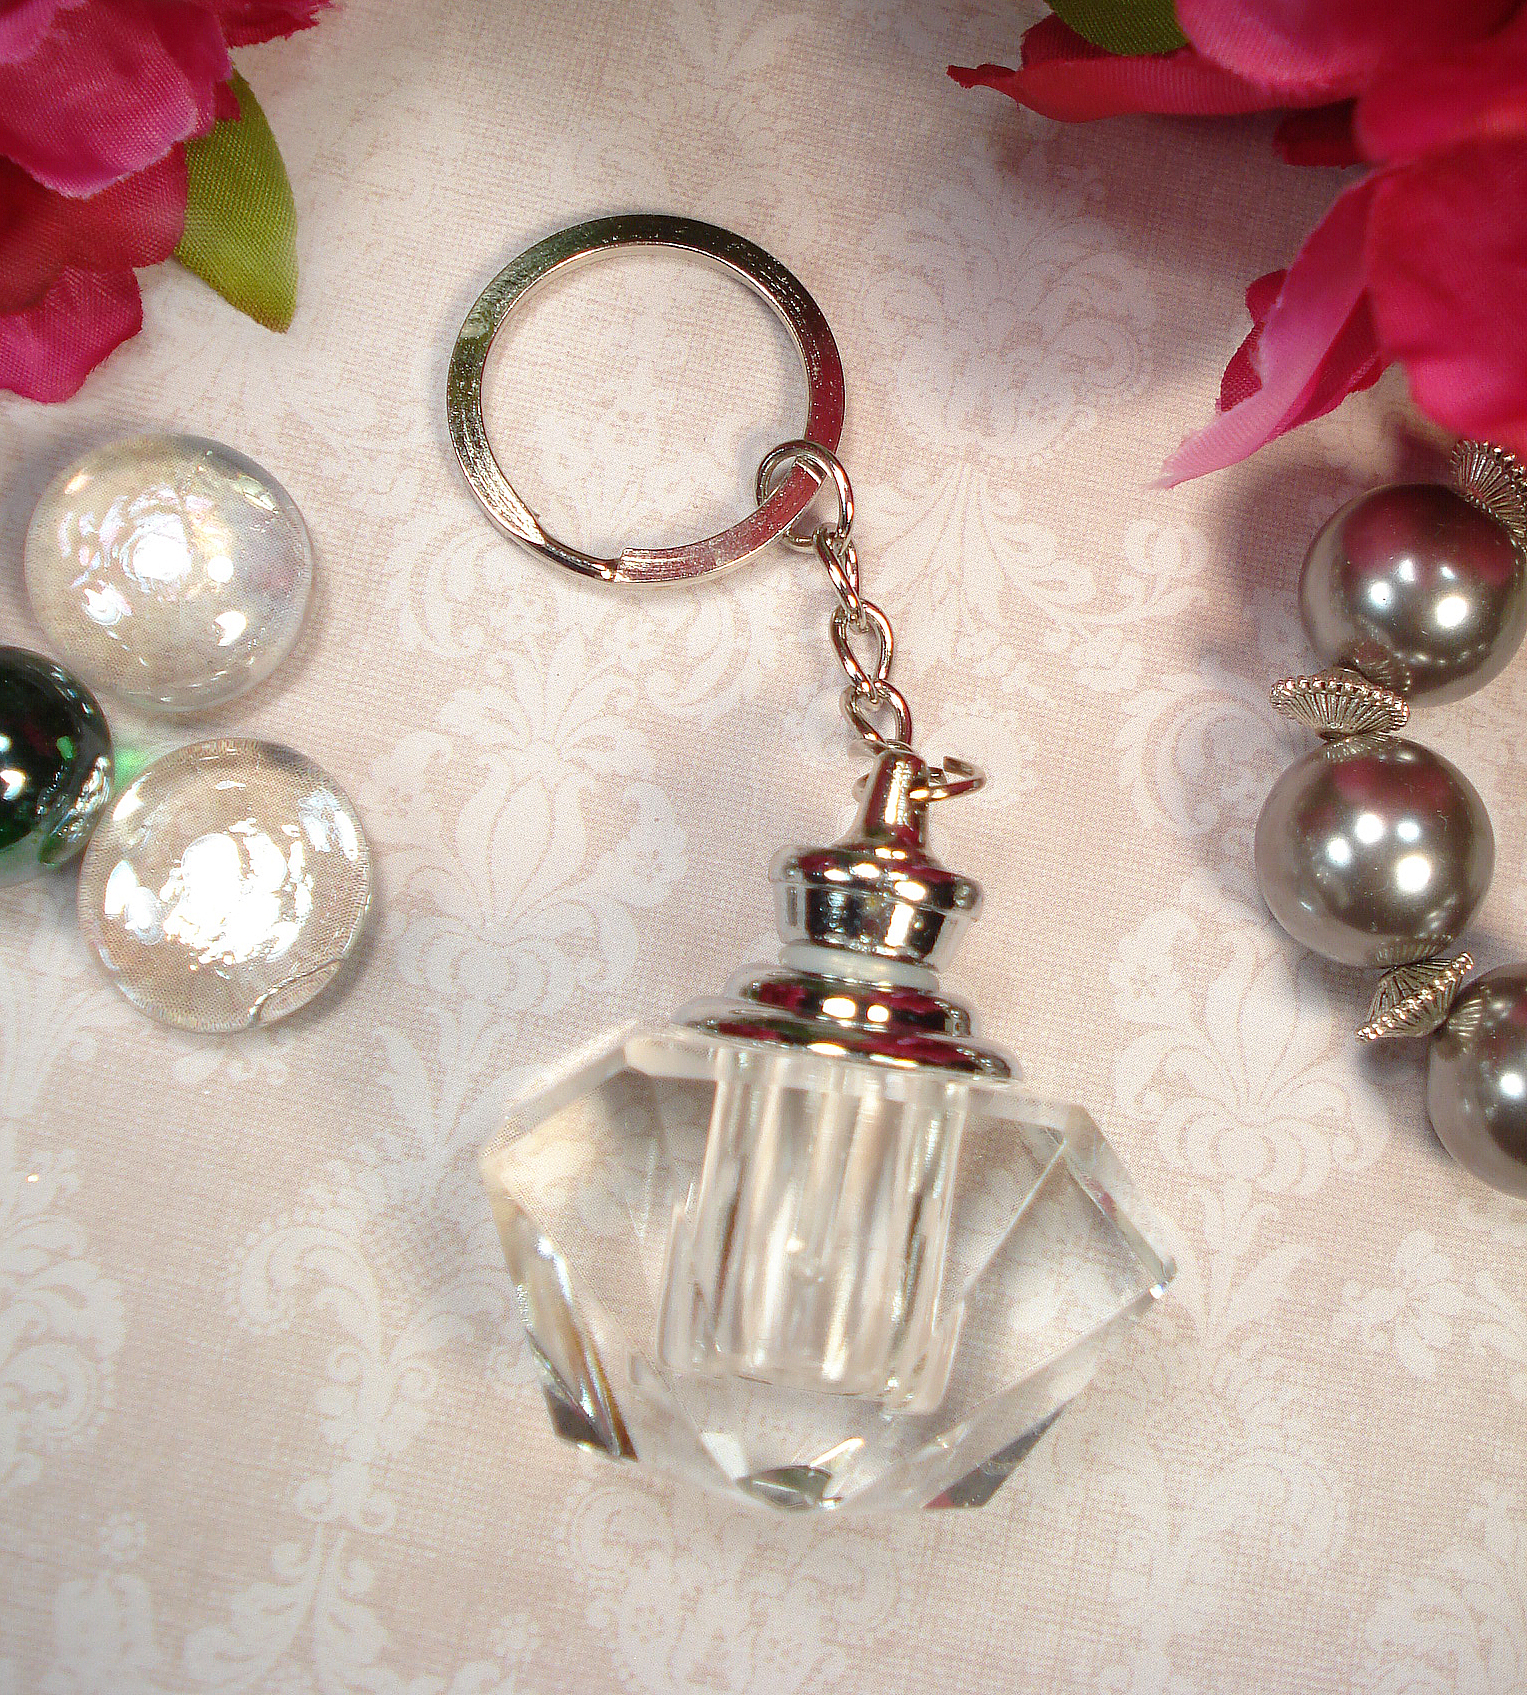 W8820-Crystal Perfume Bottle Keychain